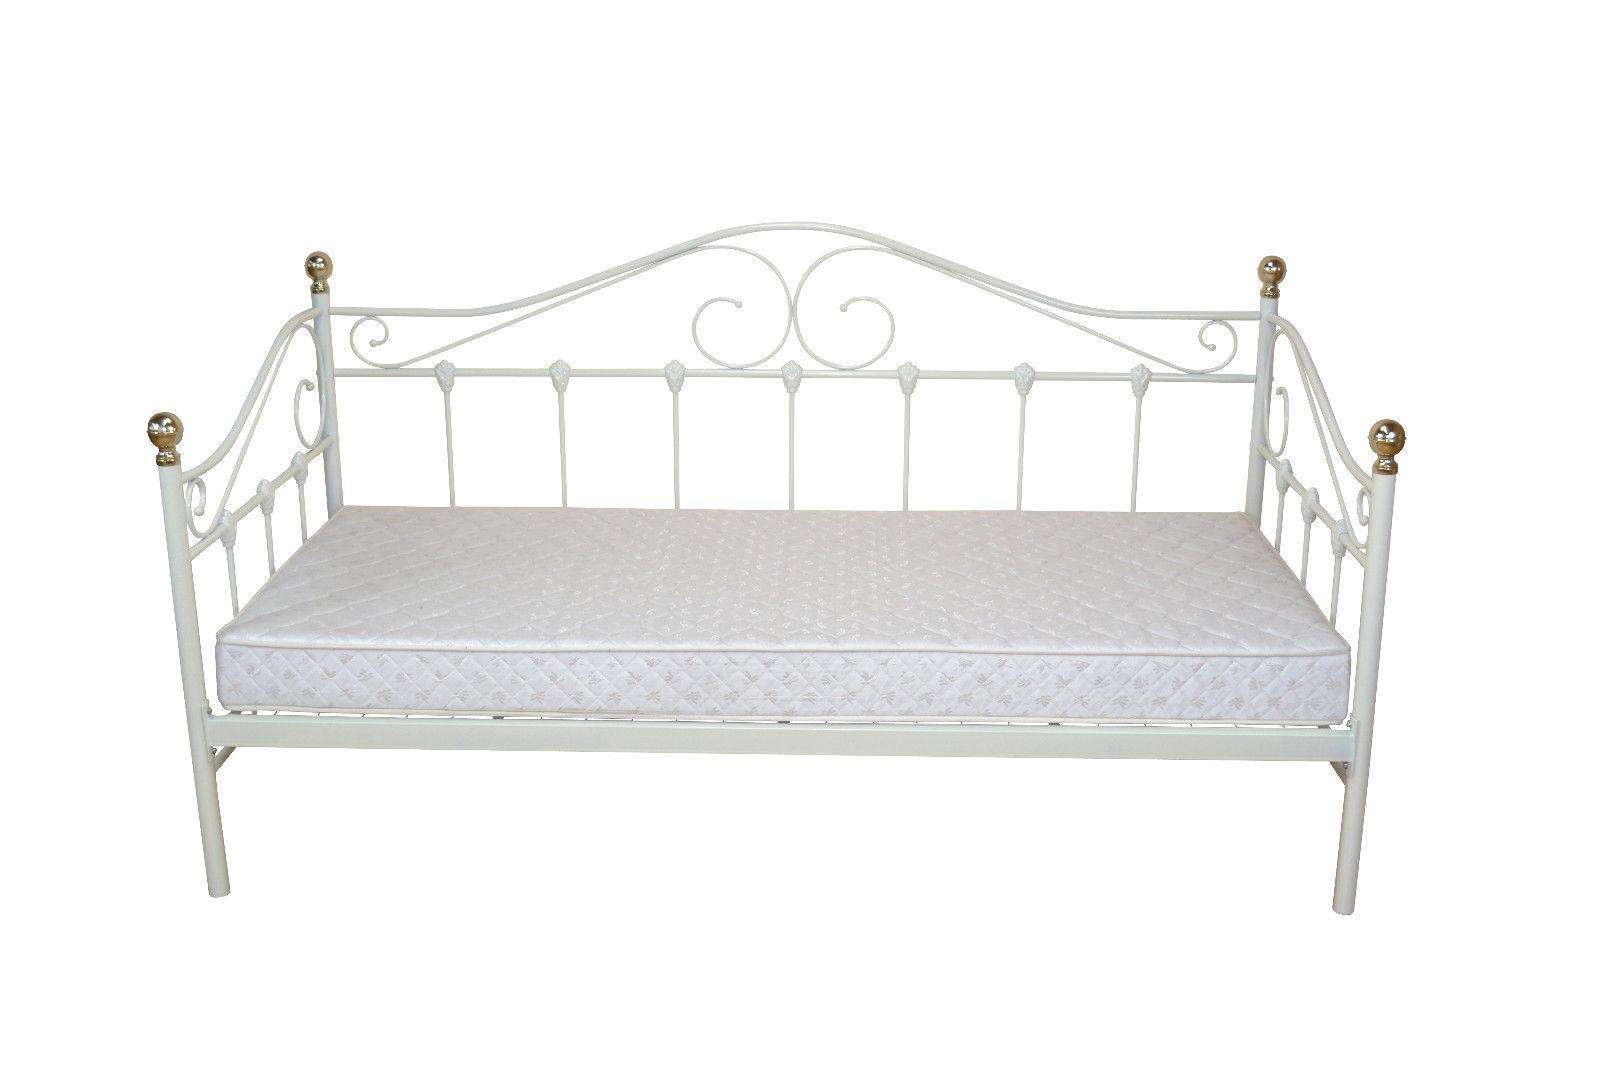 metallbett 90 200 wei. Black Bedroom Furniture Sets. Home Design Ideas